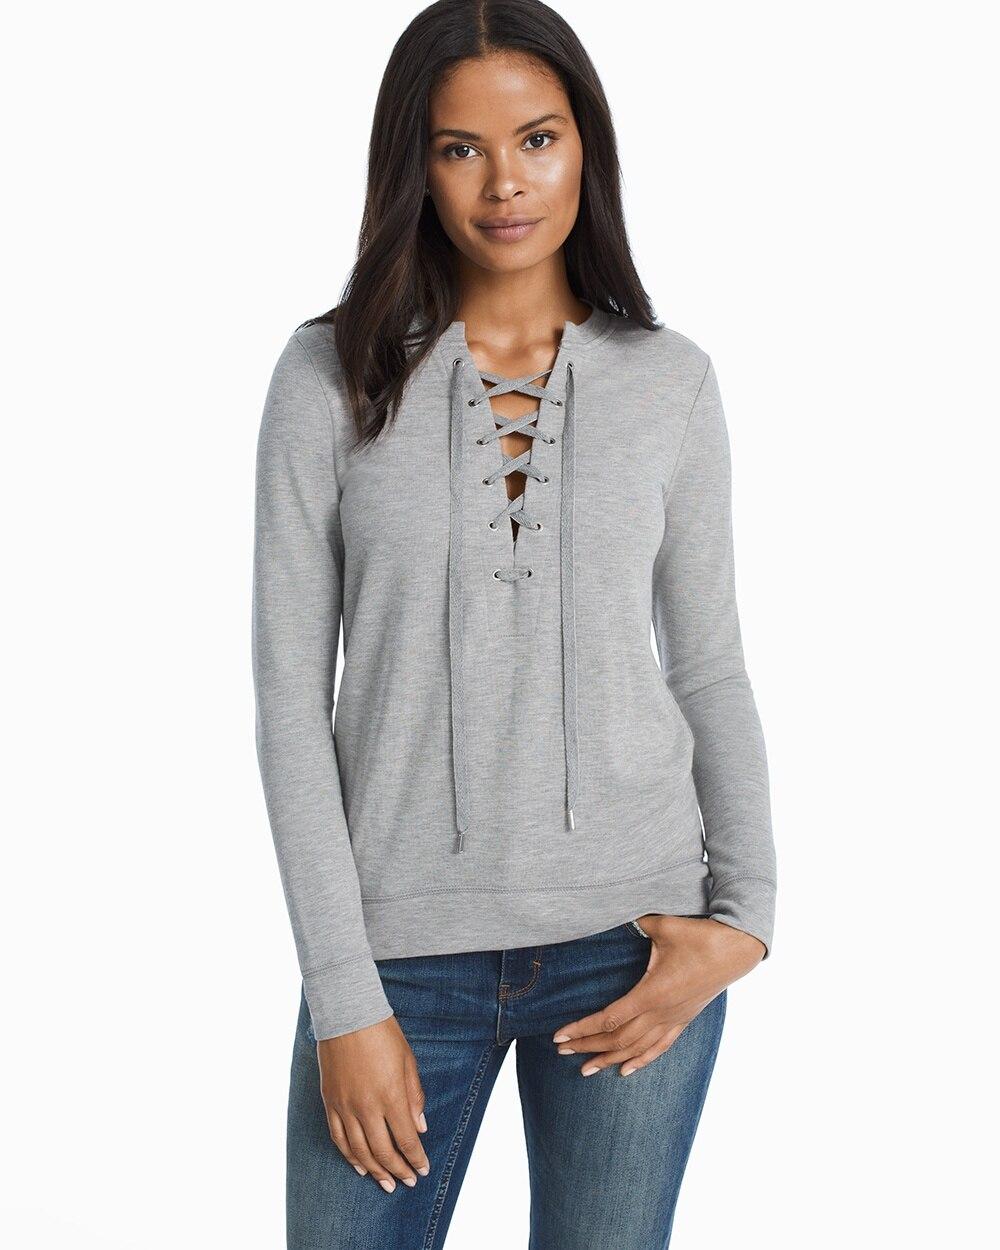 ccf60d1b2b Lace-Up Sweatshirt - White House Black Market